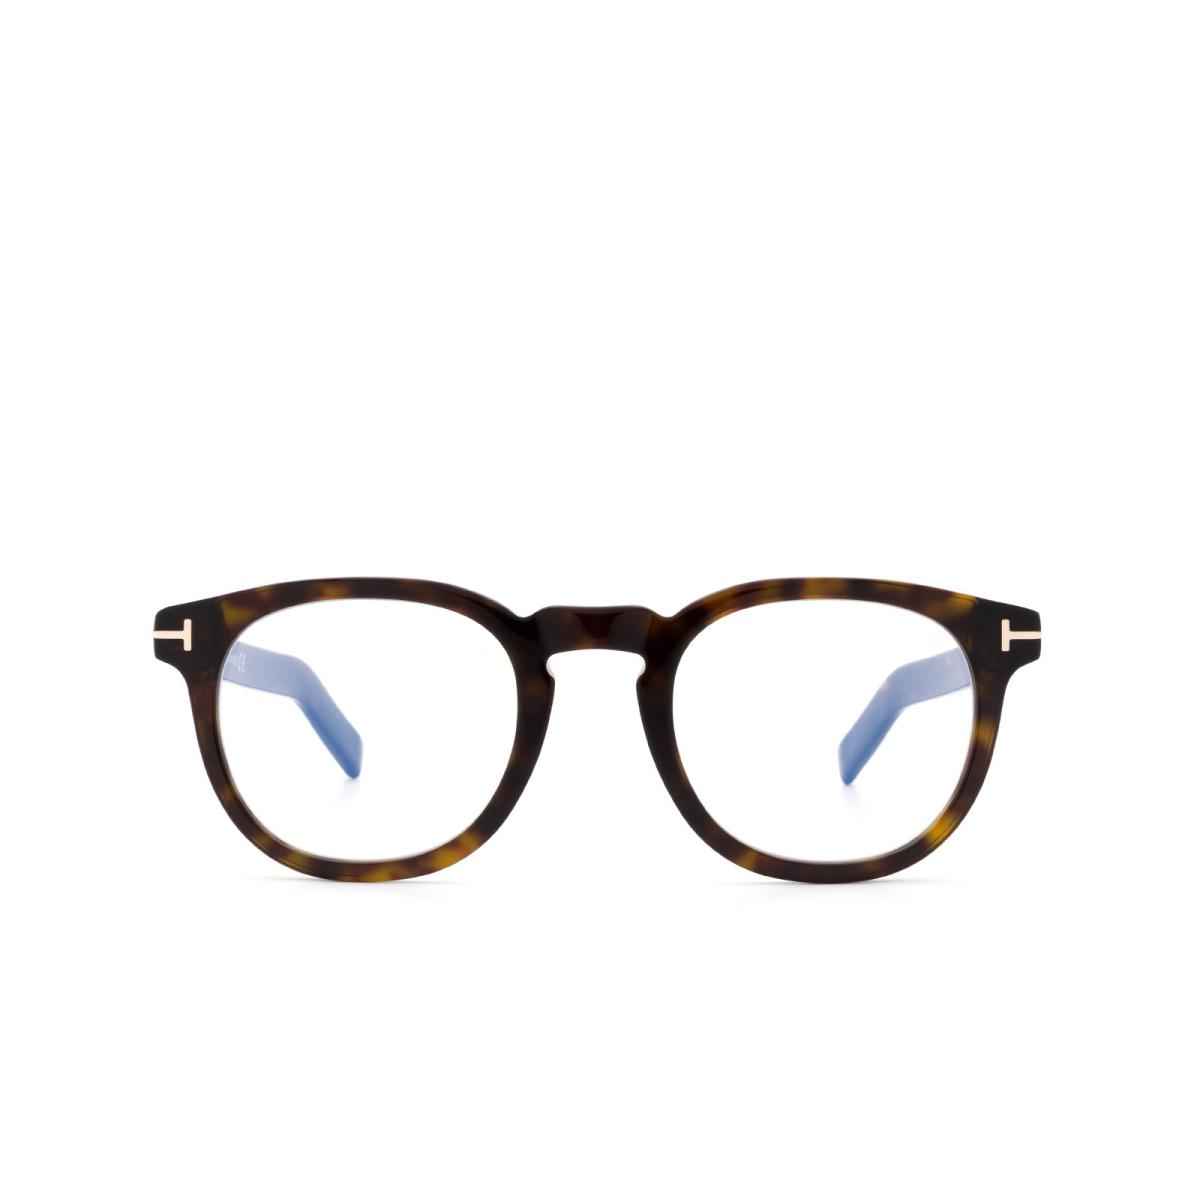 Tom Ford® Square Eyeglasses: FT5629-B color Dark Havana 052.